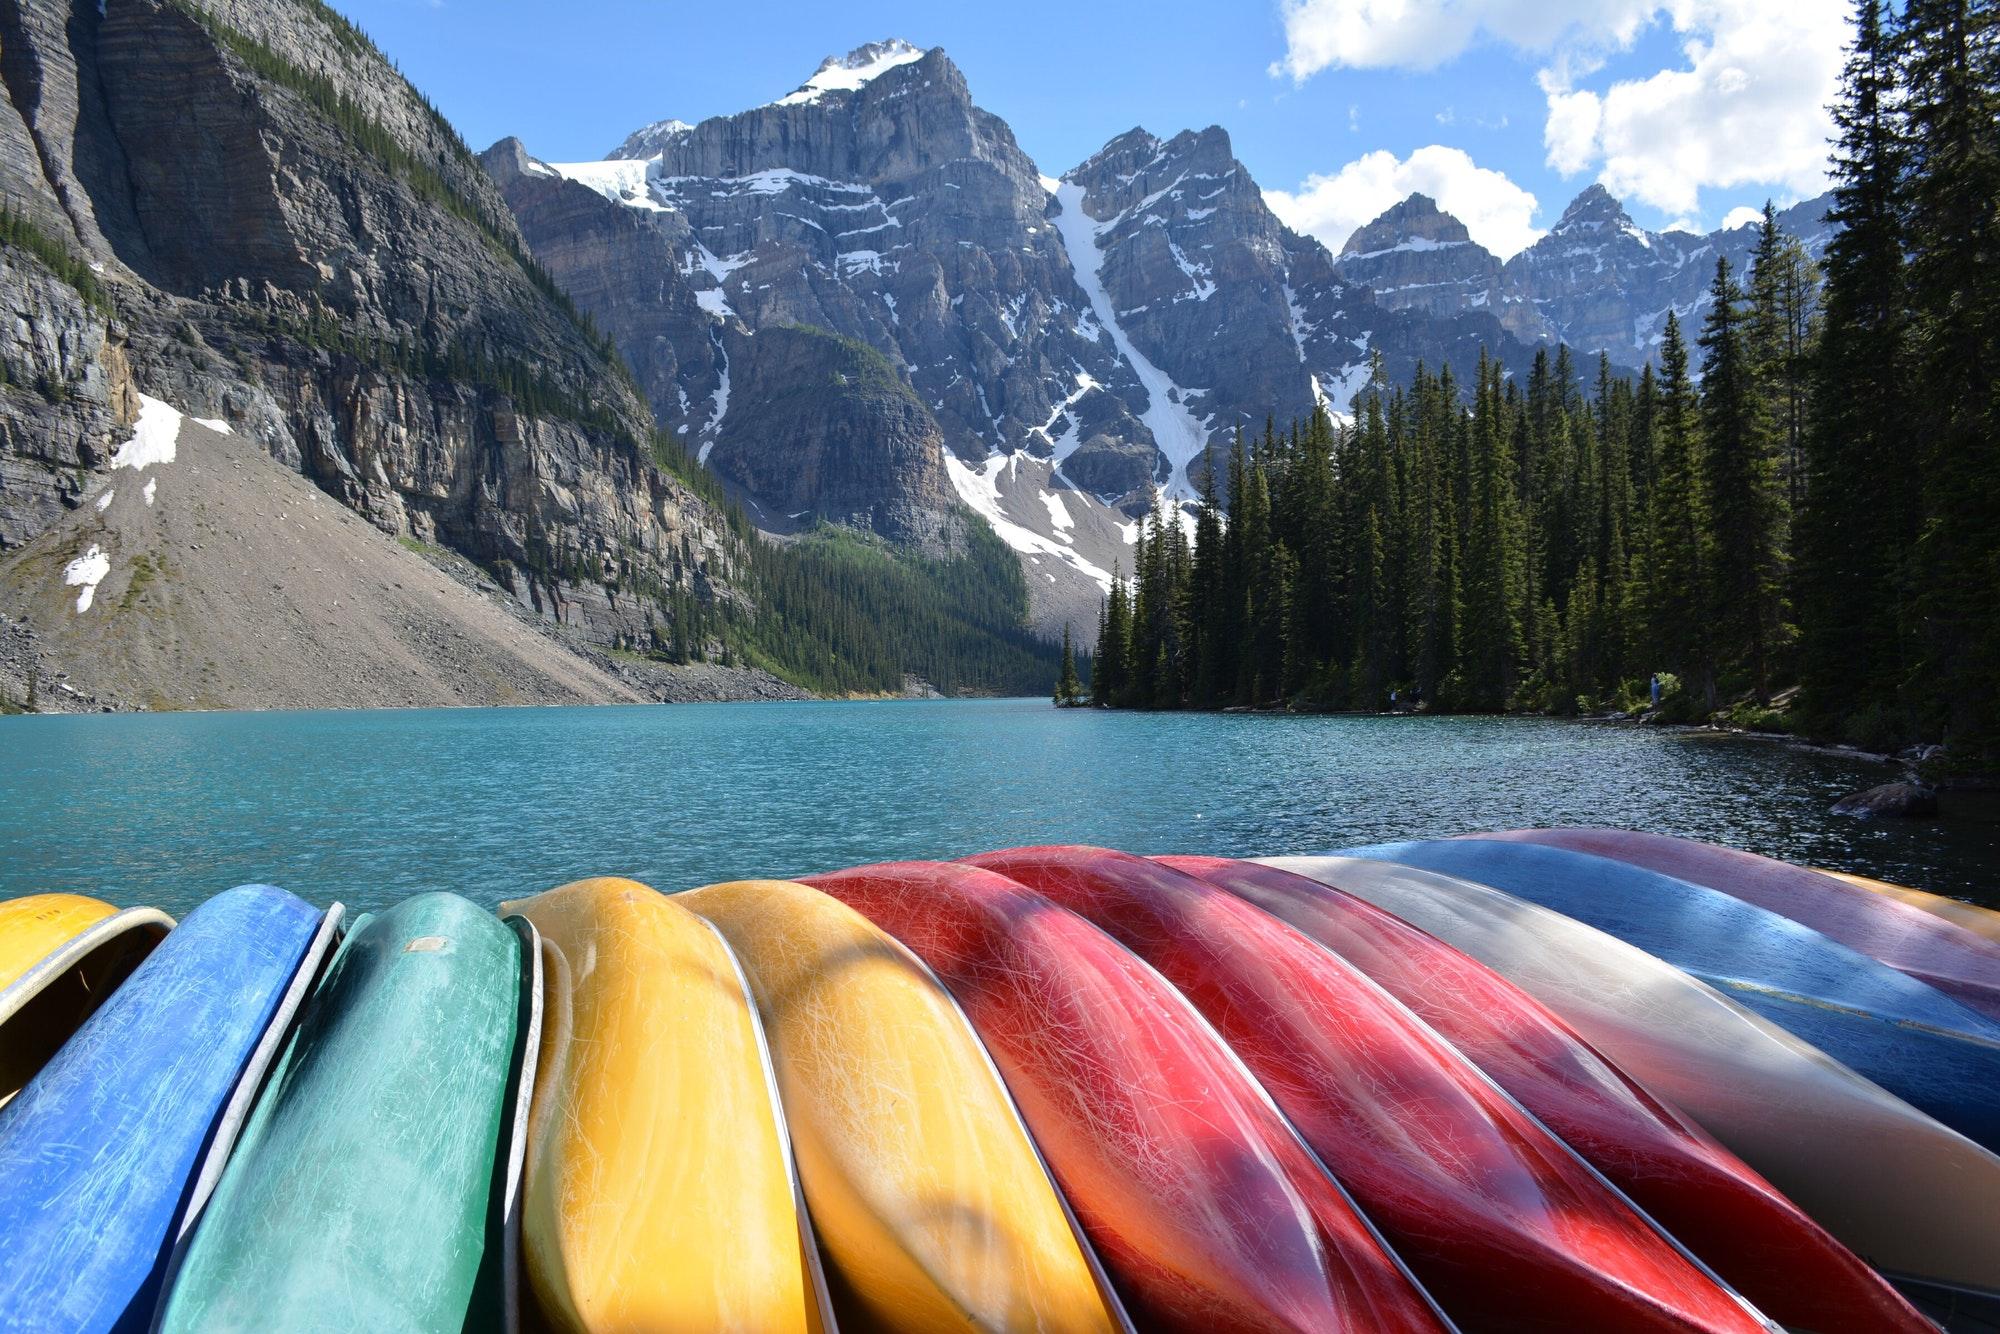 Lake Moraine, Banff National Park, Canada.